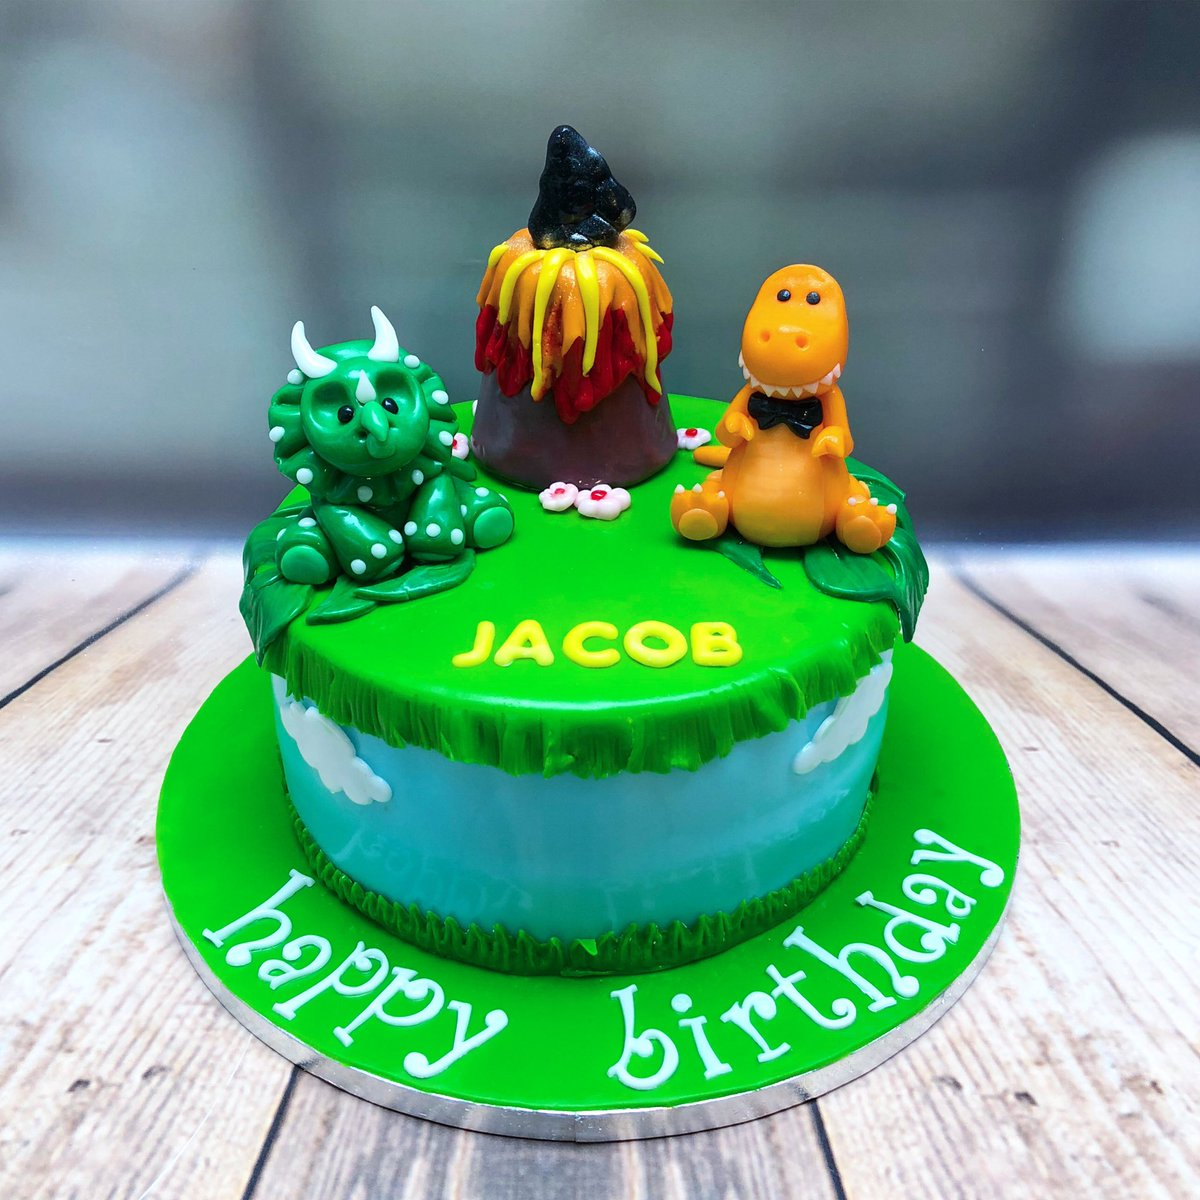 Lego Ninjago Birthday Cake Asda Cakes Asda Groceriesbatman Birthday